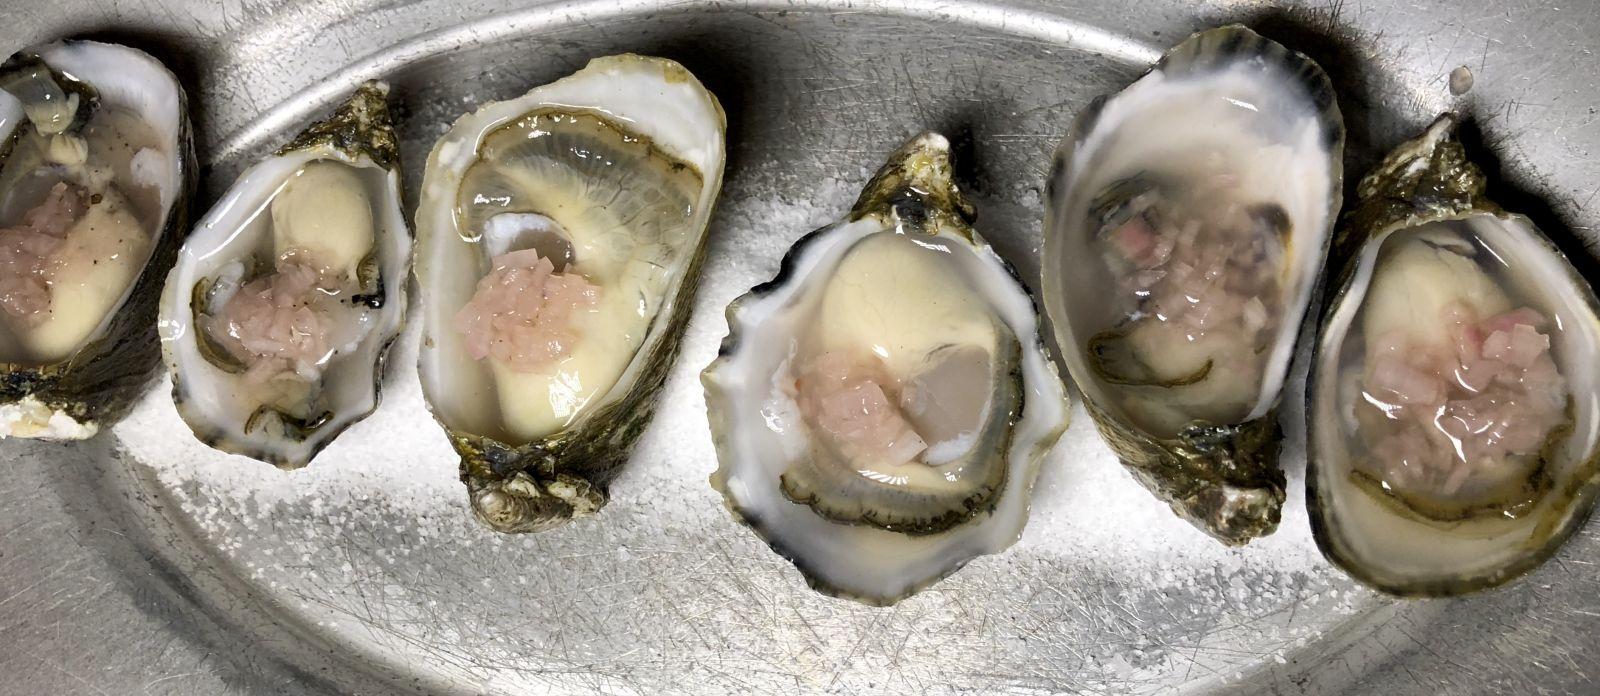 netarts-bay-oysters-thistle-oregon